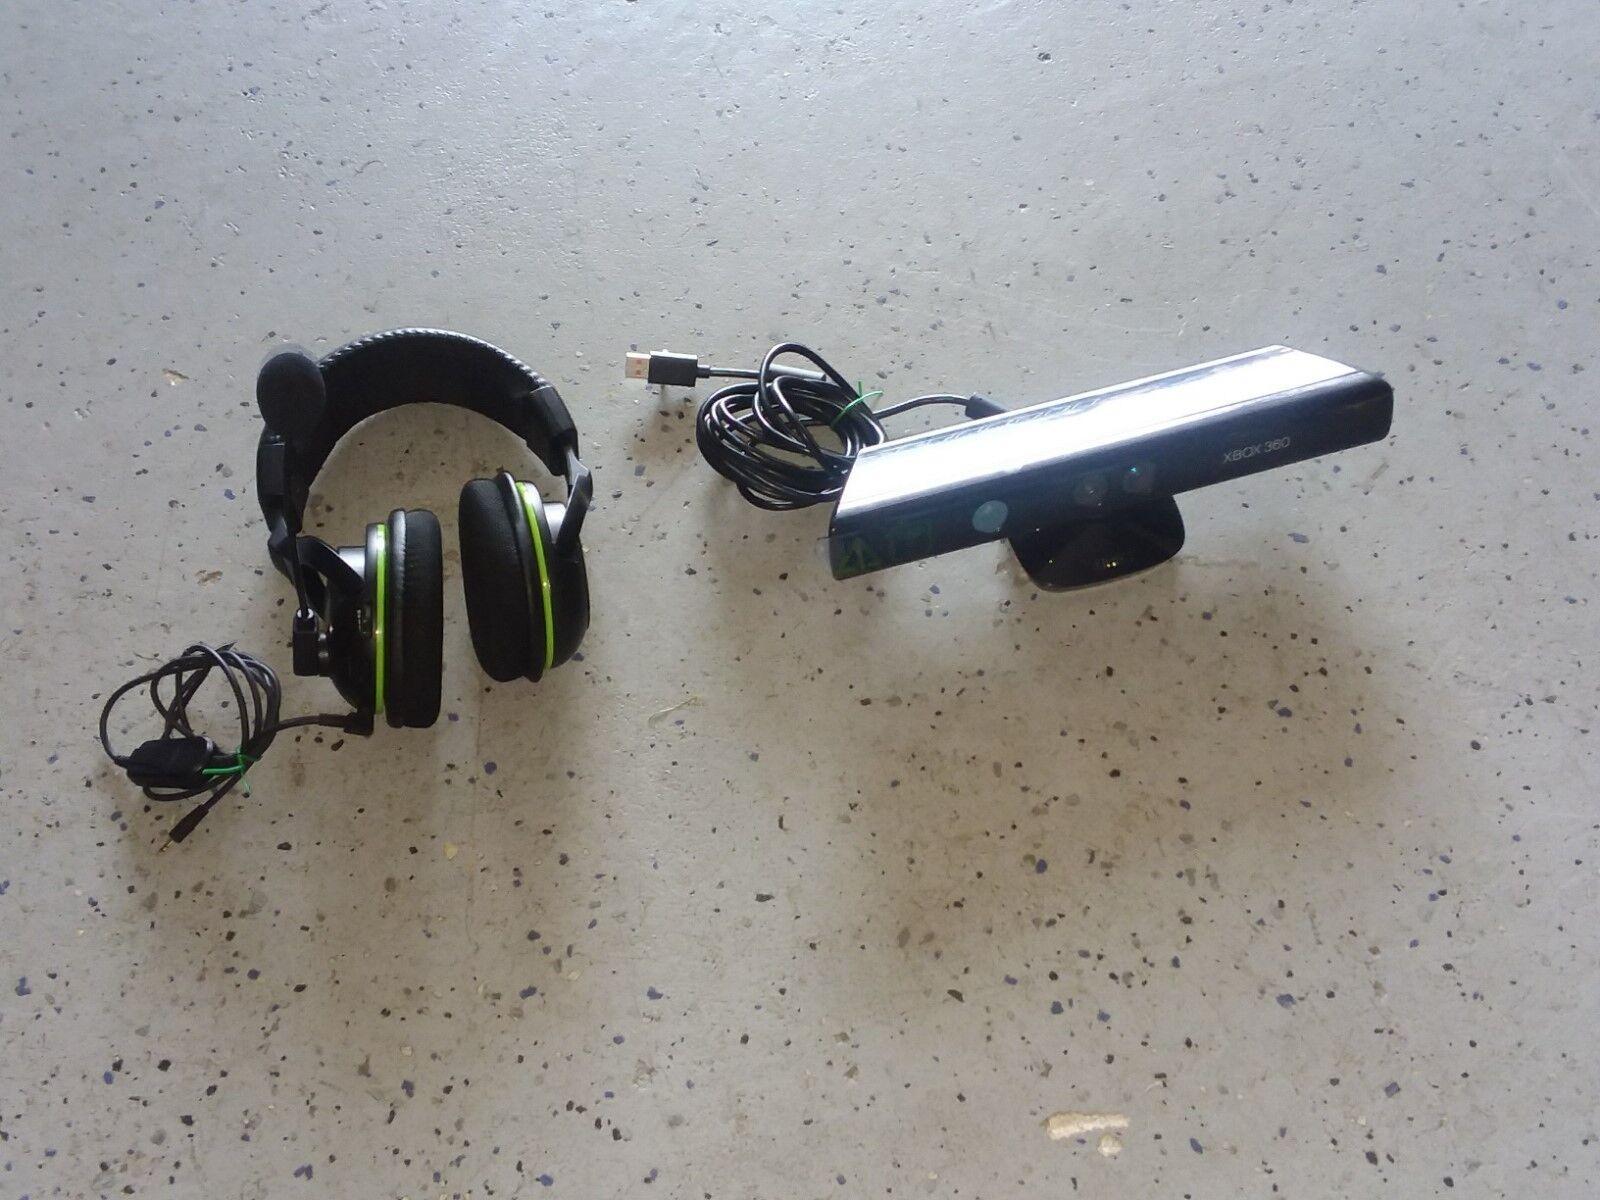 Genuine OEM Microsoft Xbox 360 Kinect Motion Sensor Bar & Earforce X32 Headset